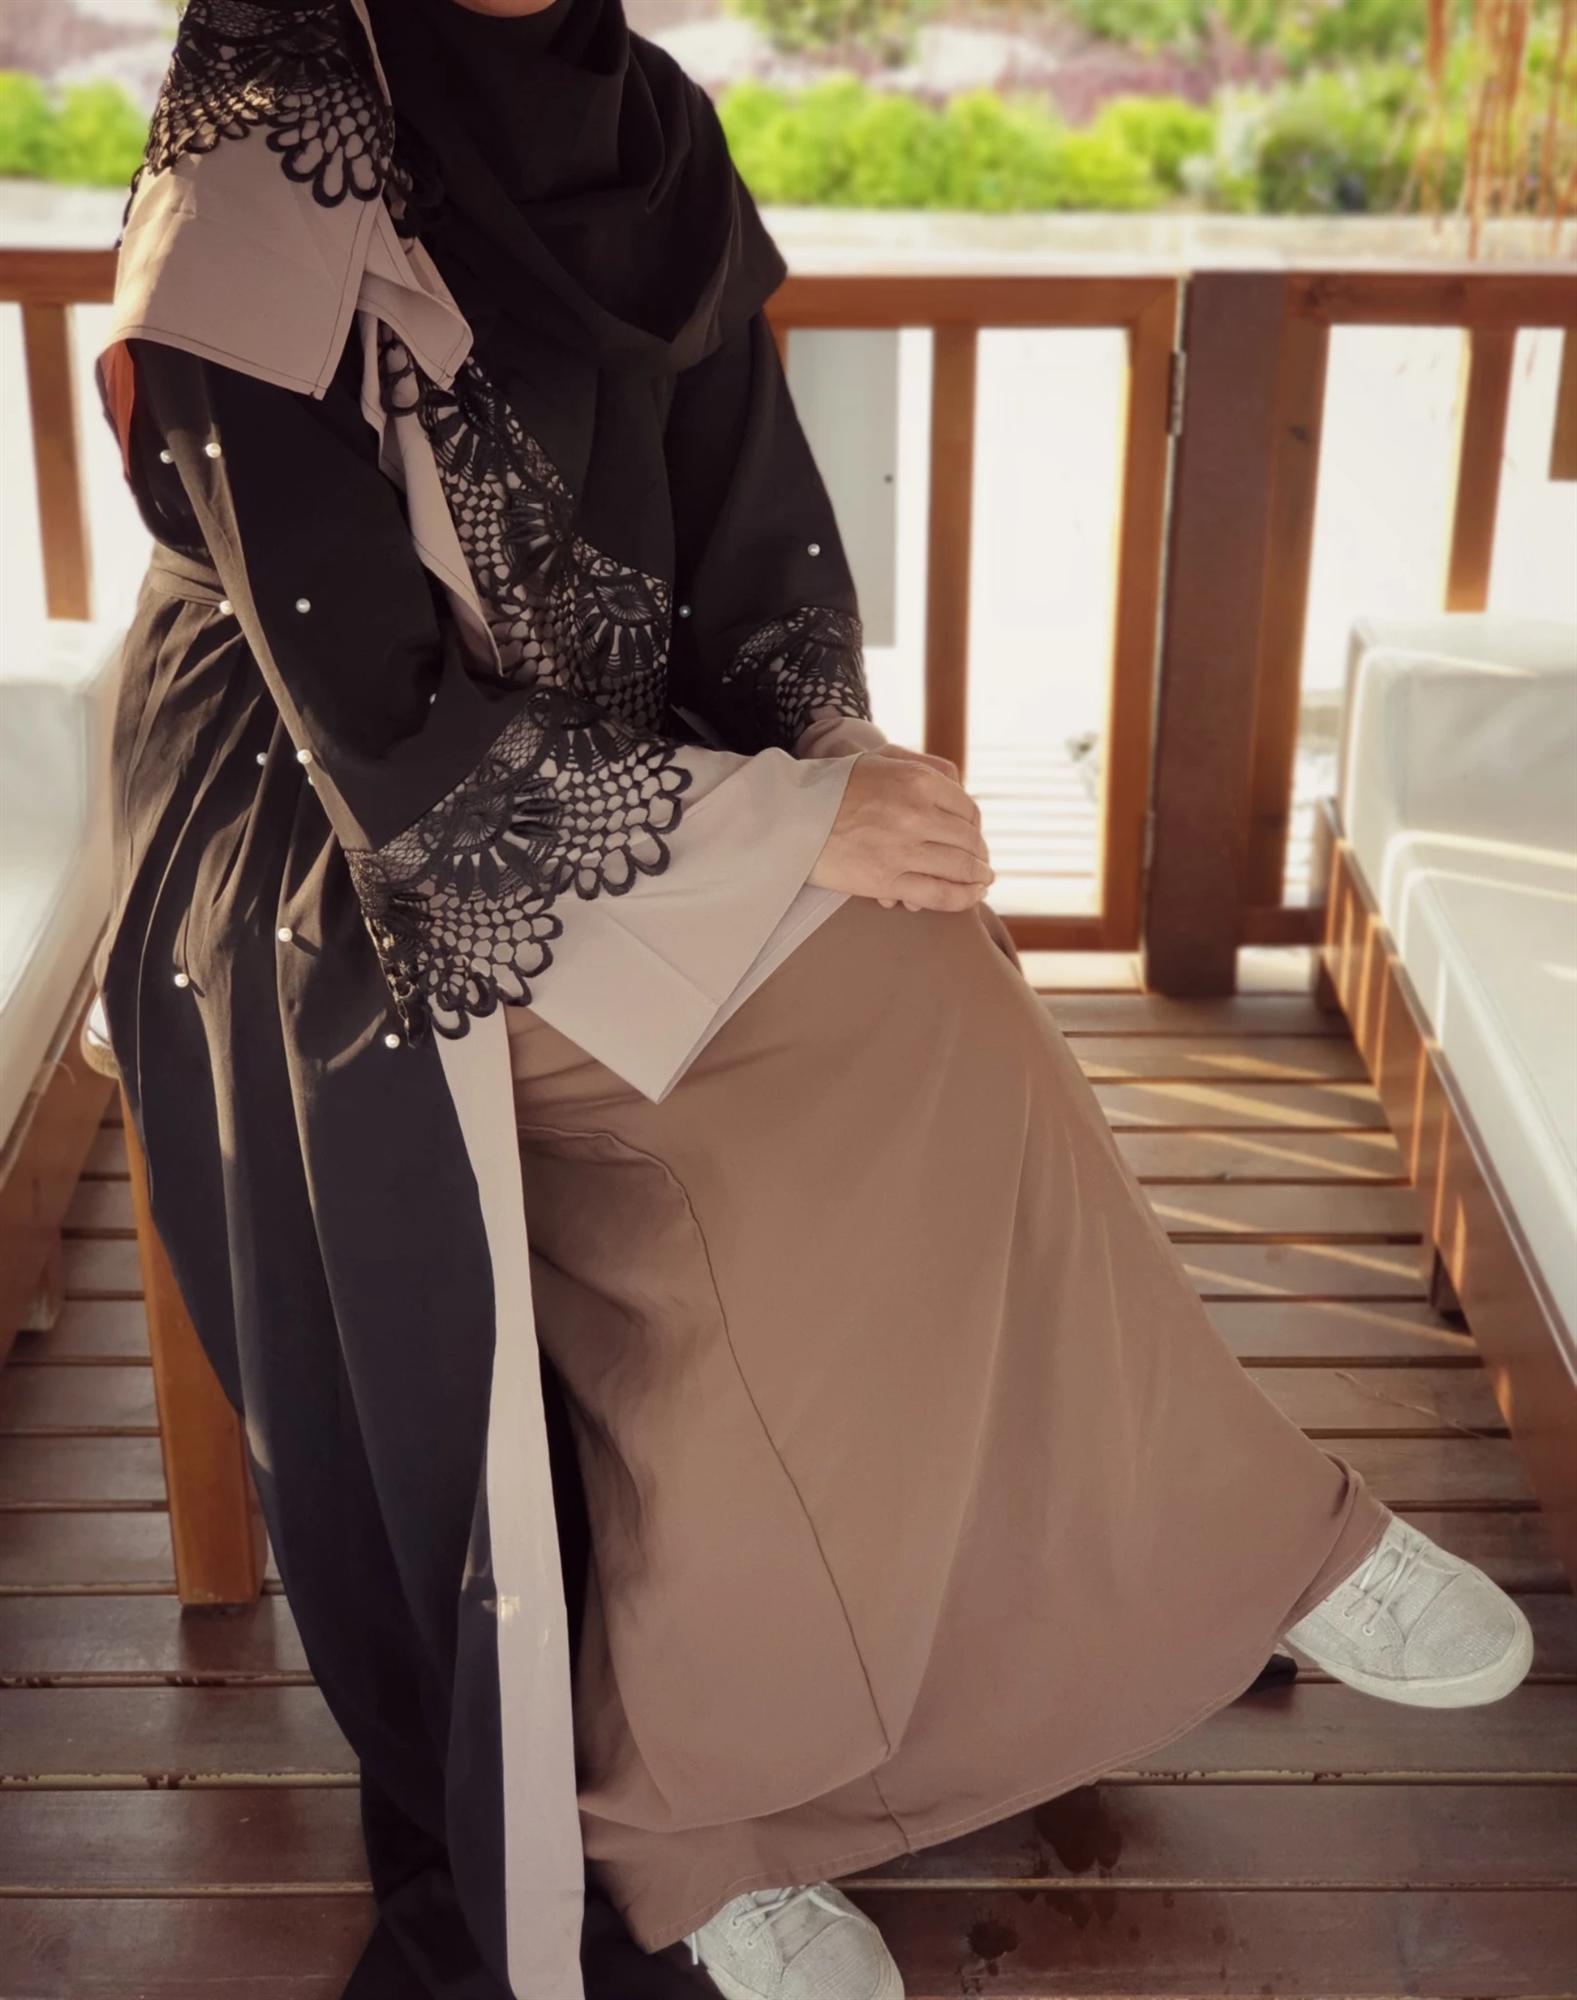 1620# Custom order new model kaftan in dubai arabic lace designs islamic women clothes elegant indonesia muslim abaya wholesale